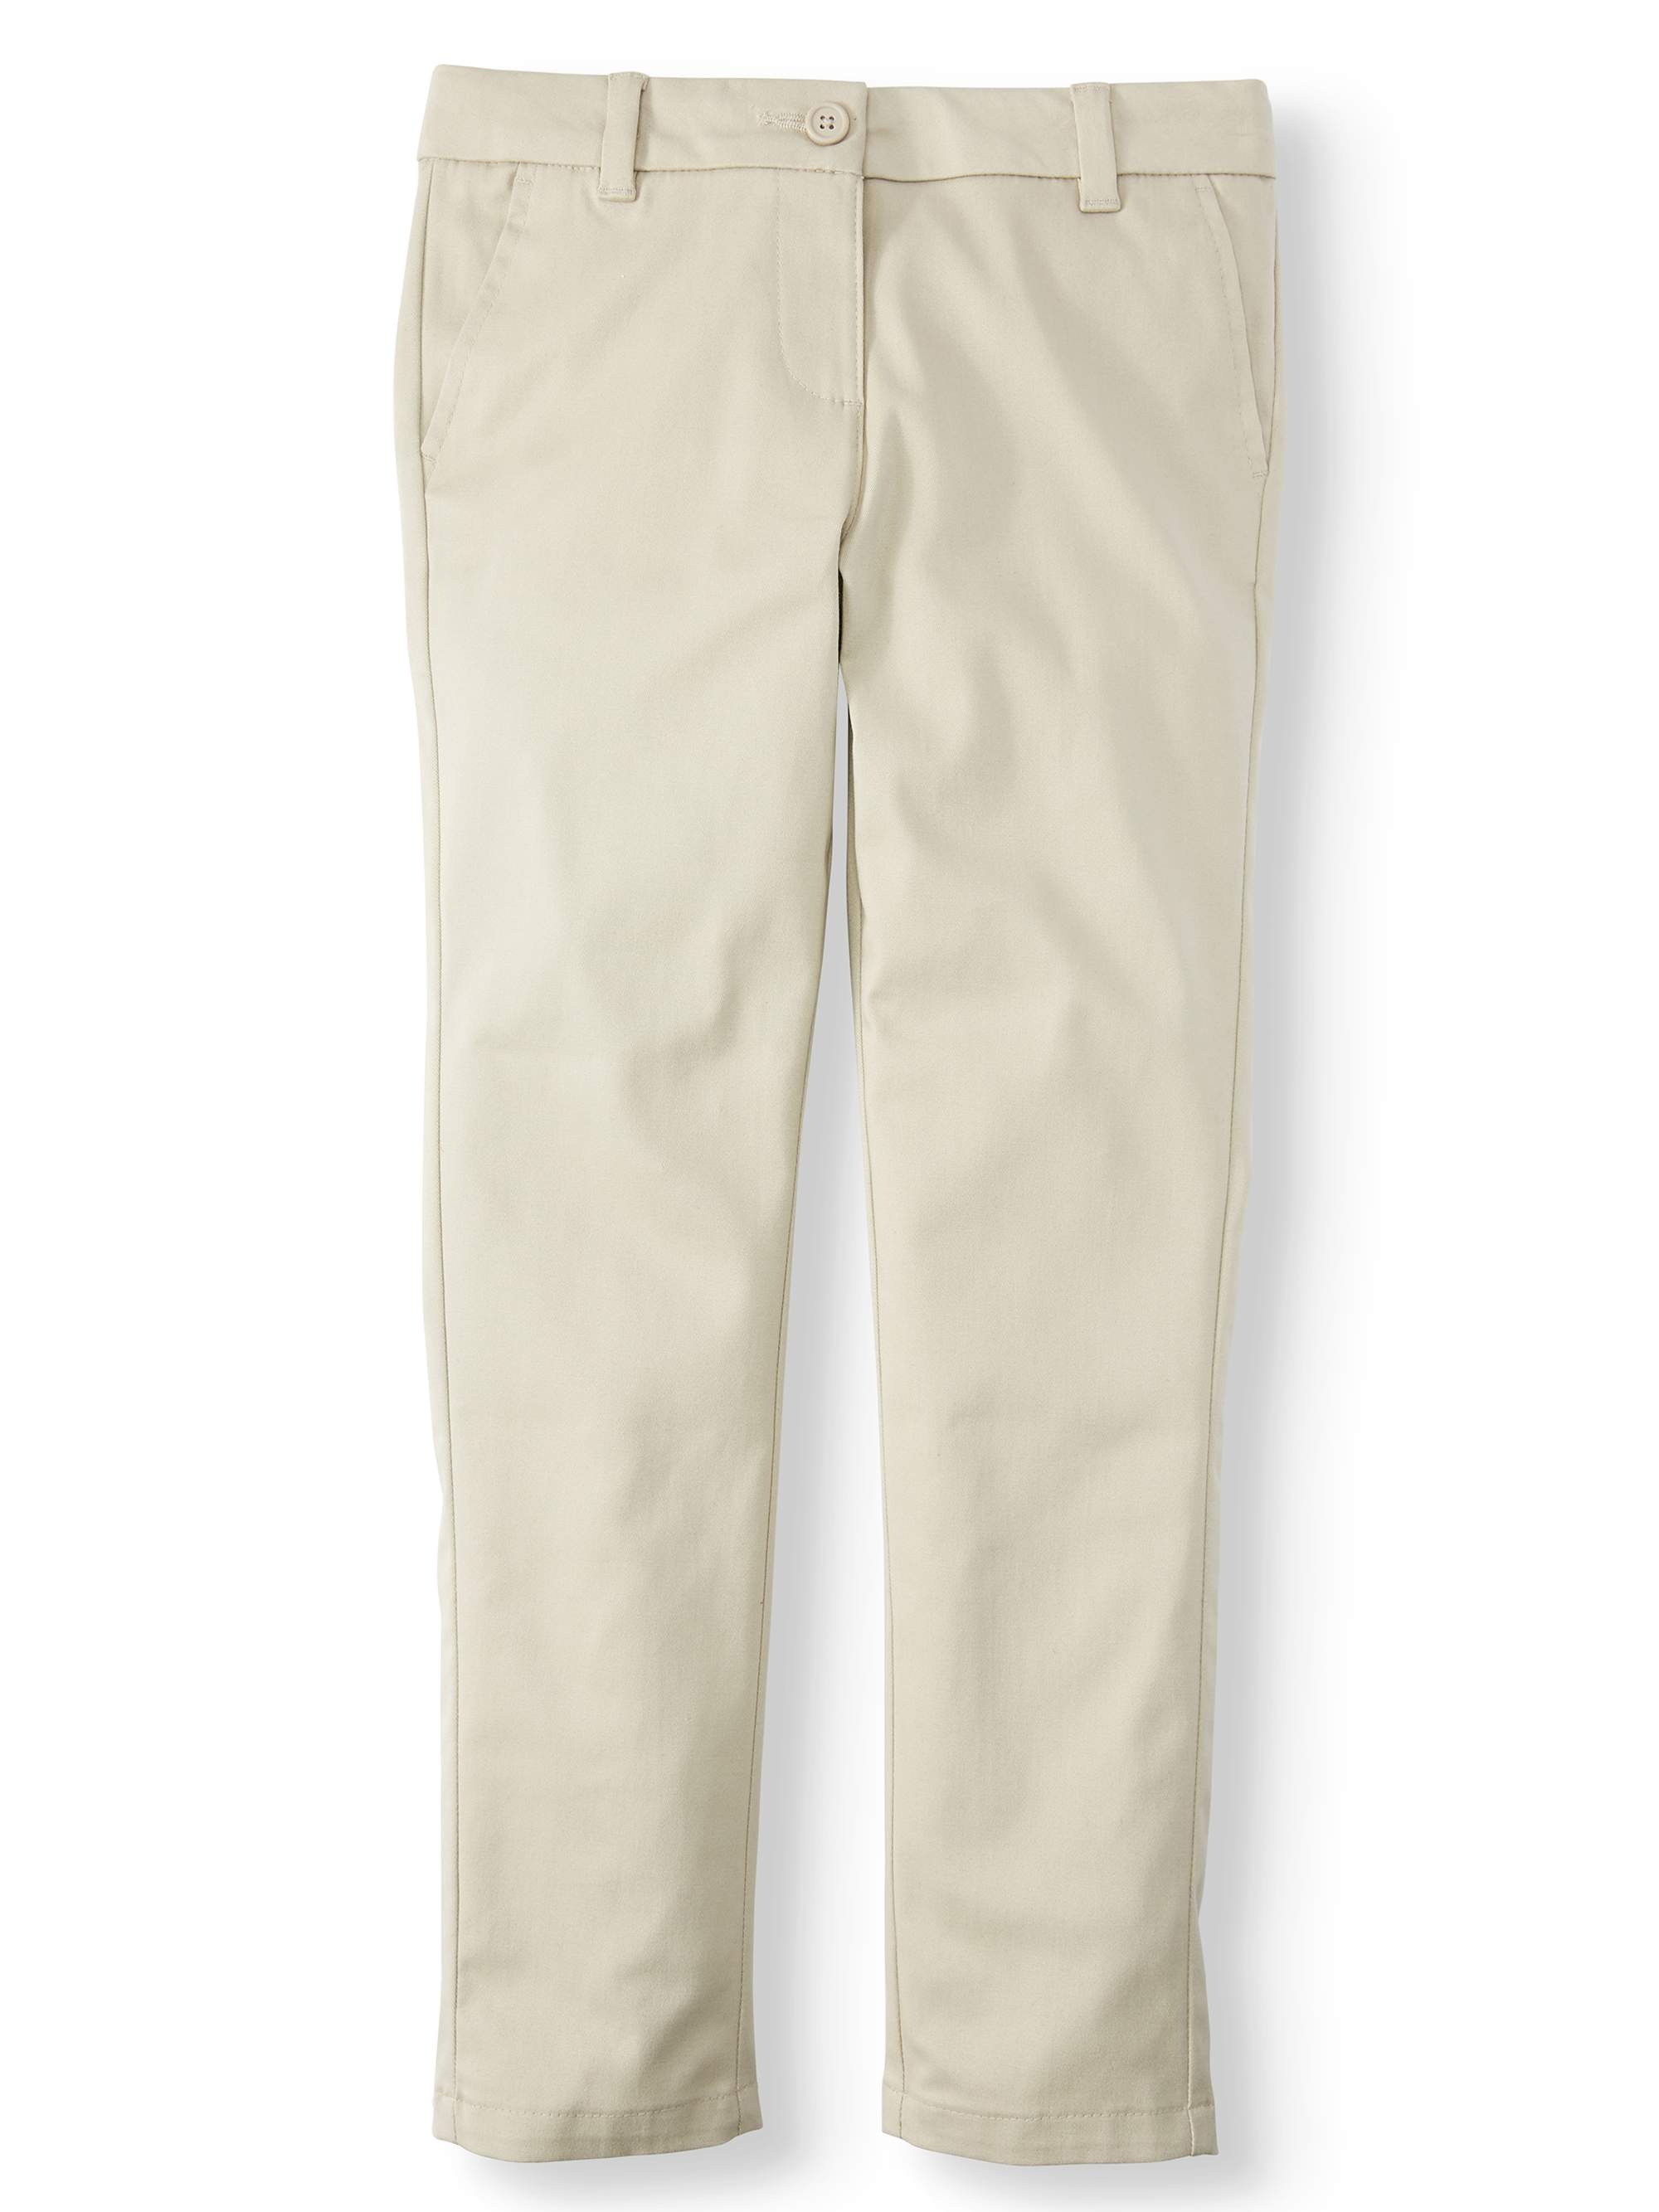 Girls jeans skinny trousers M /& S age 4 5 6 7 8 9 years stretch denim grey NEW